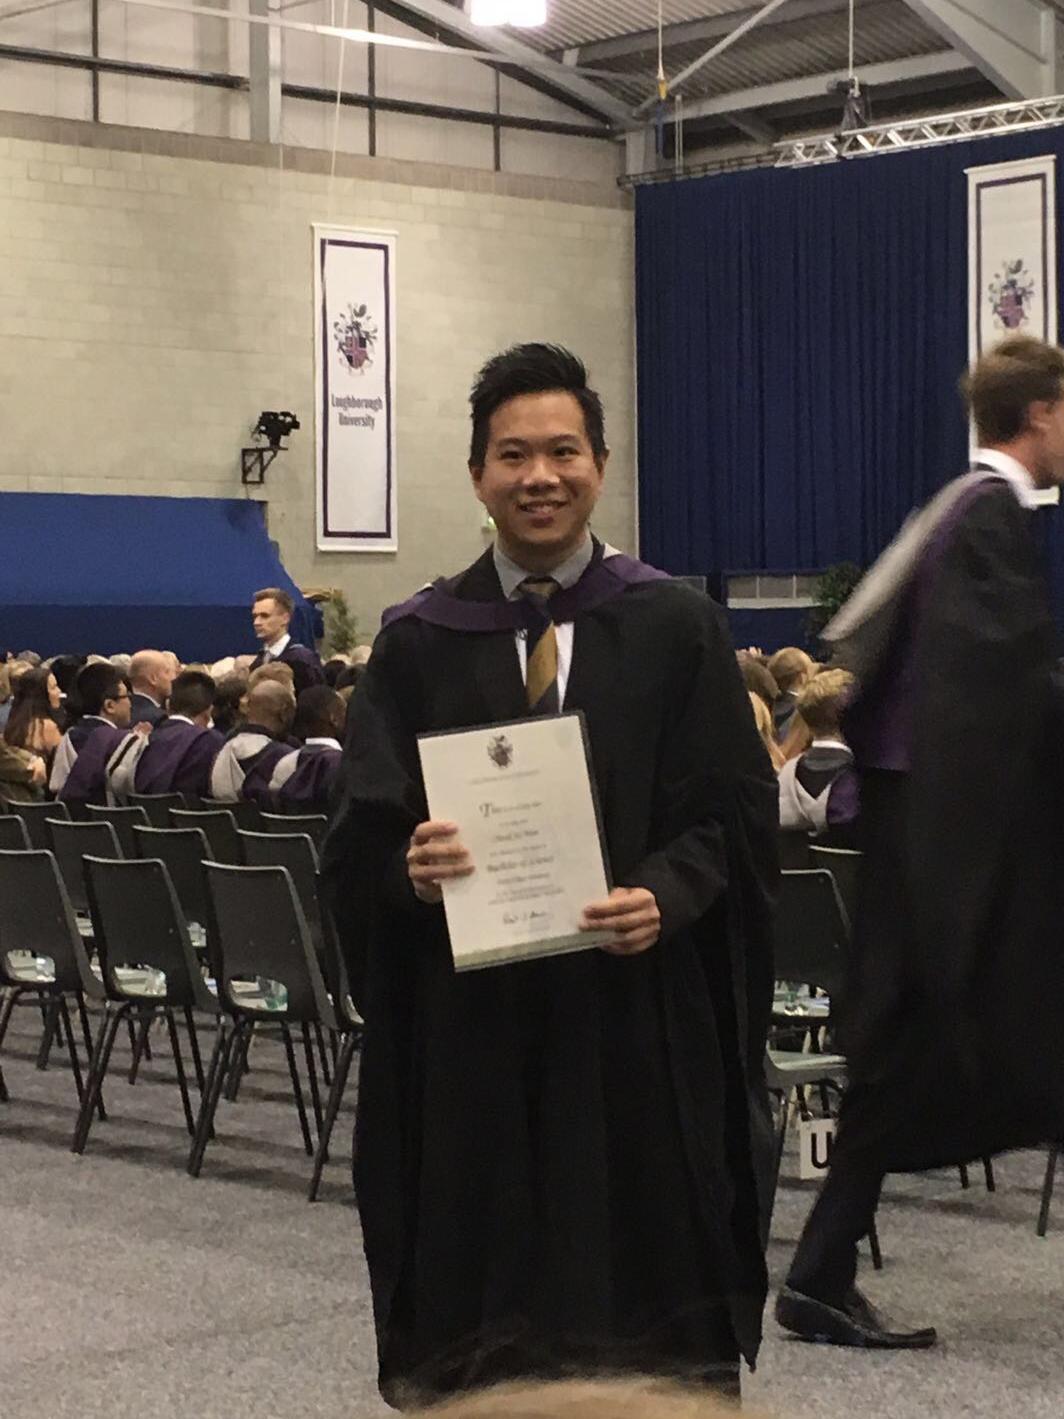 Jacky and his diploma